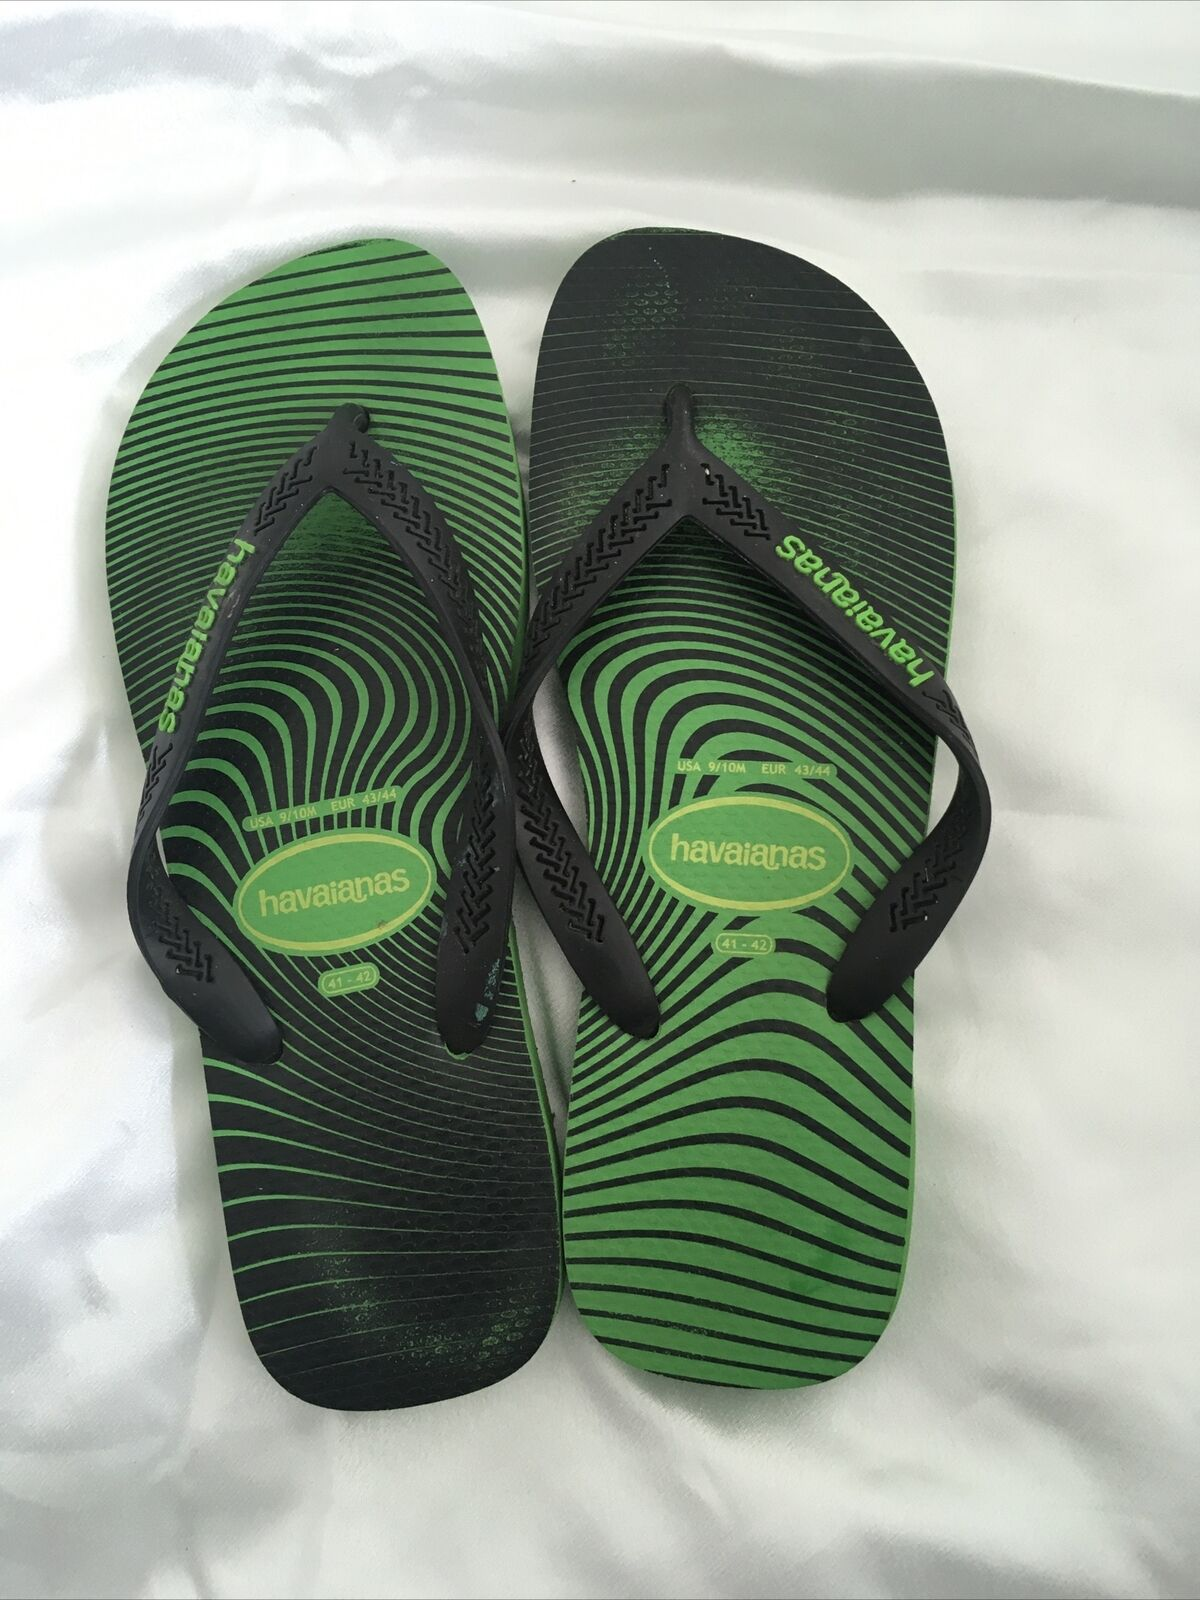 Havaianas Green Flip Flops Size 41